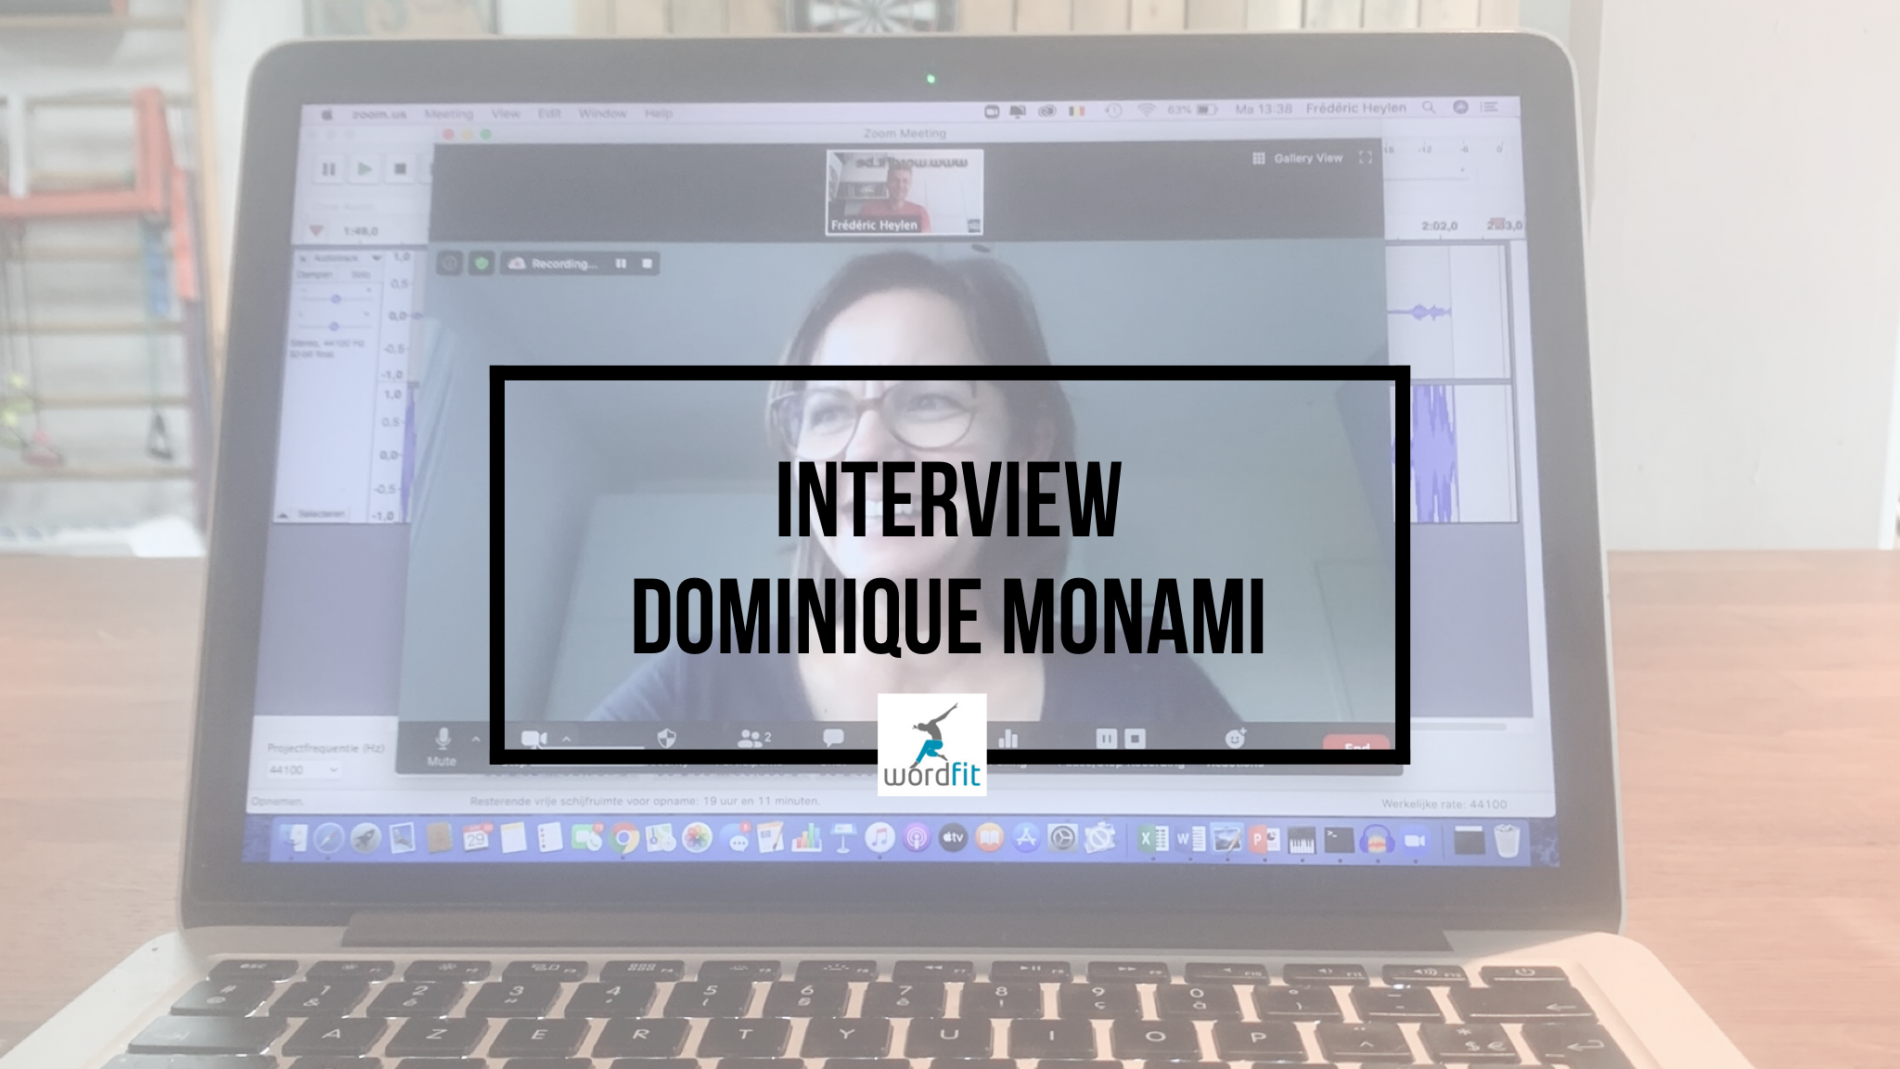 Interview Dominique Monami Goed in je Vel-podcast Fré Heylen WordFit